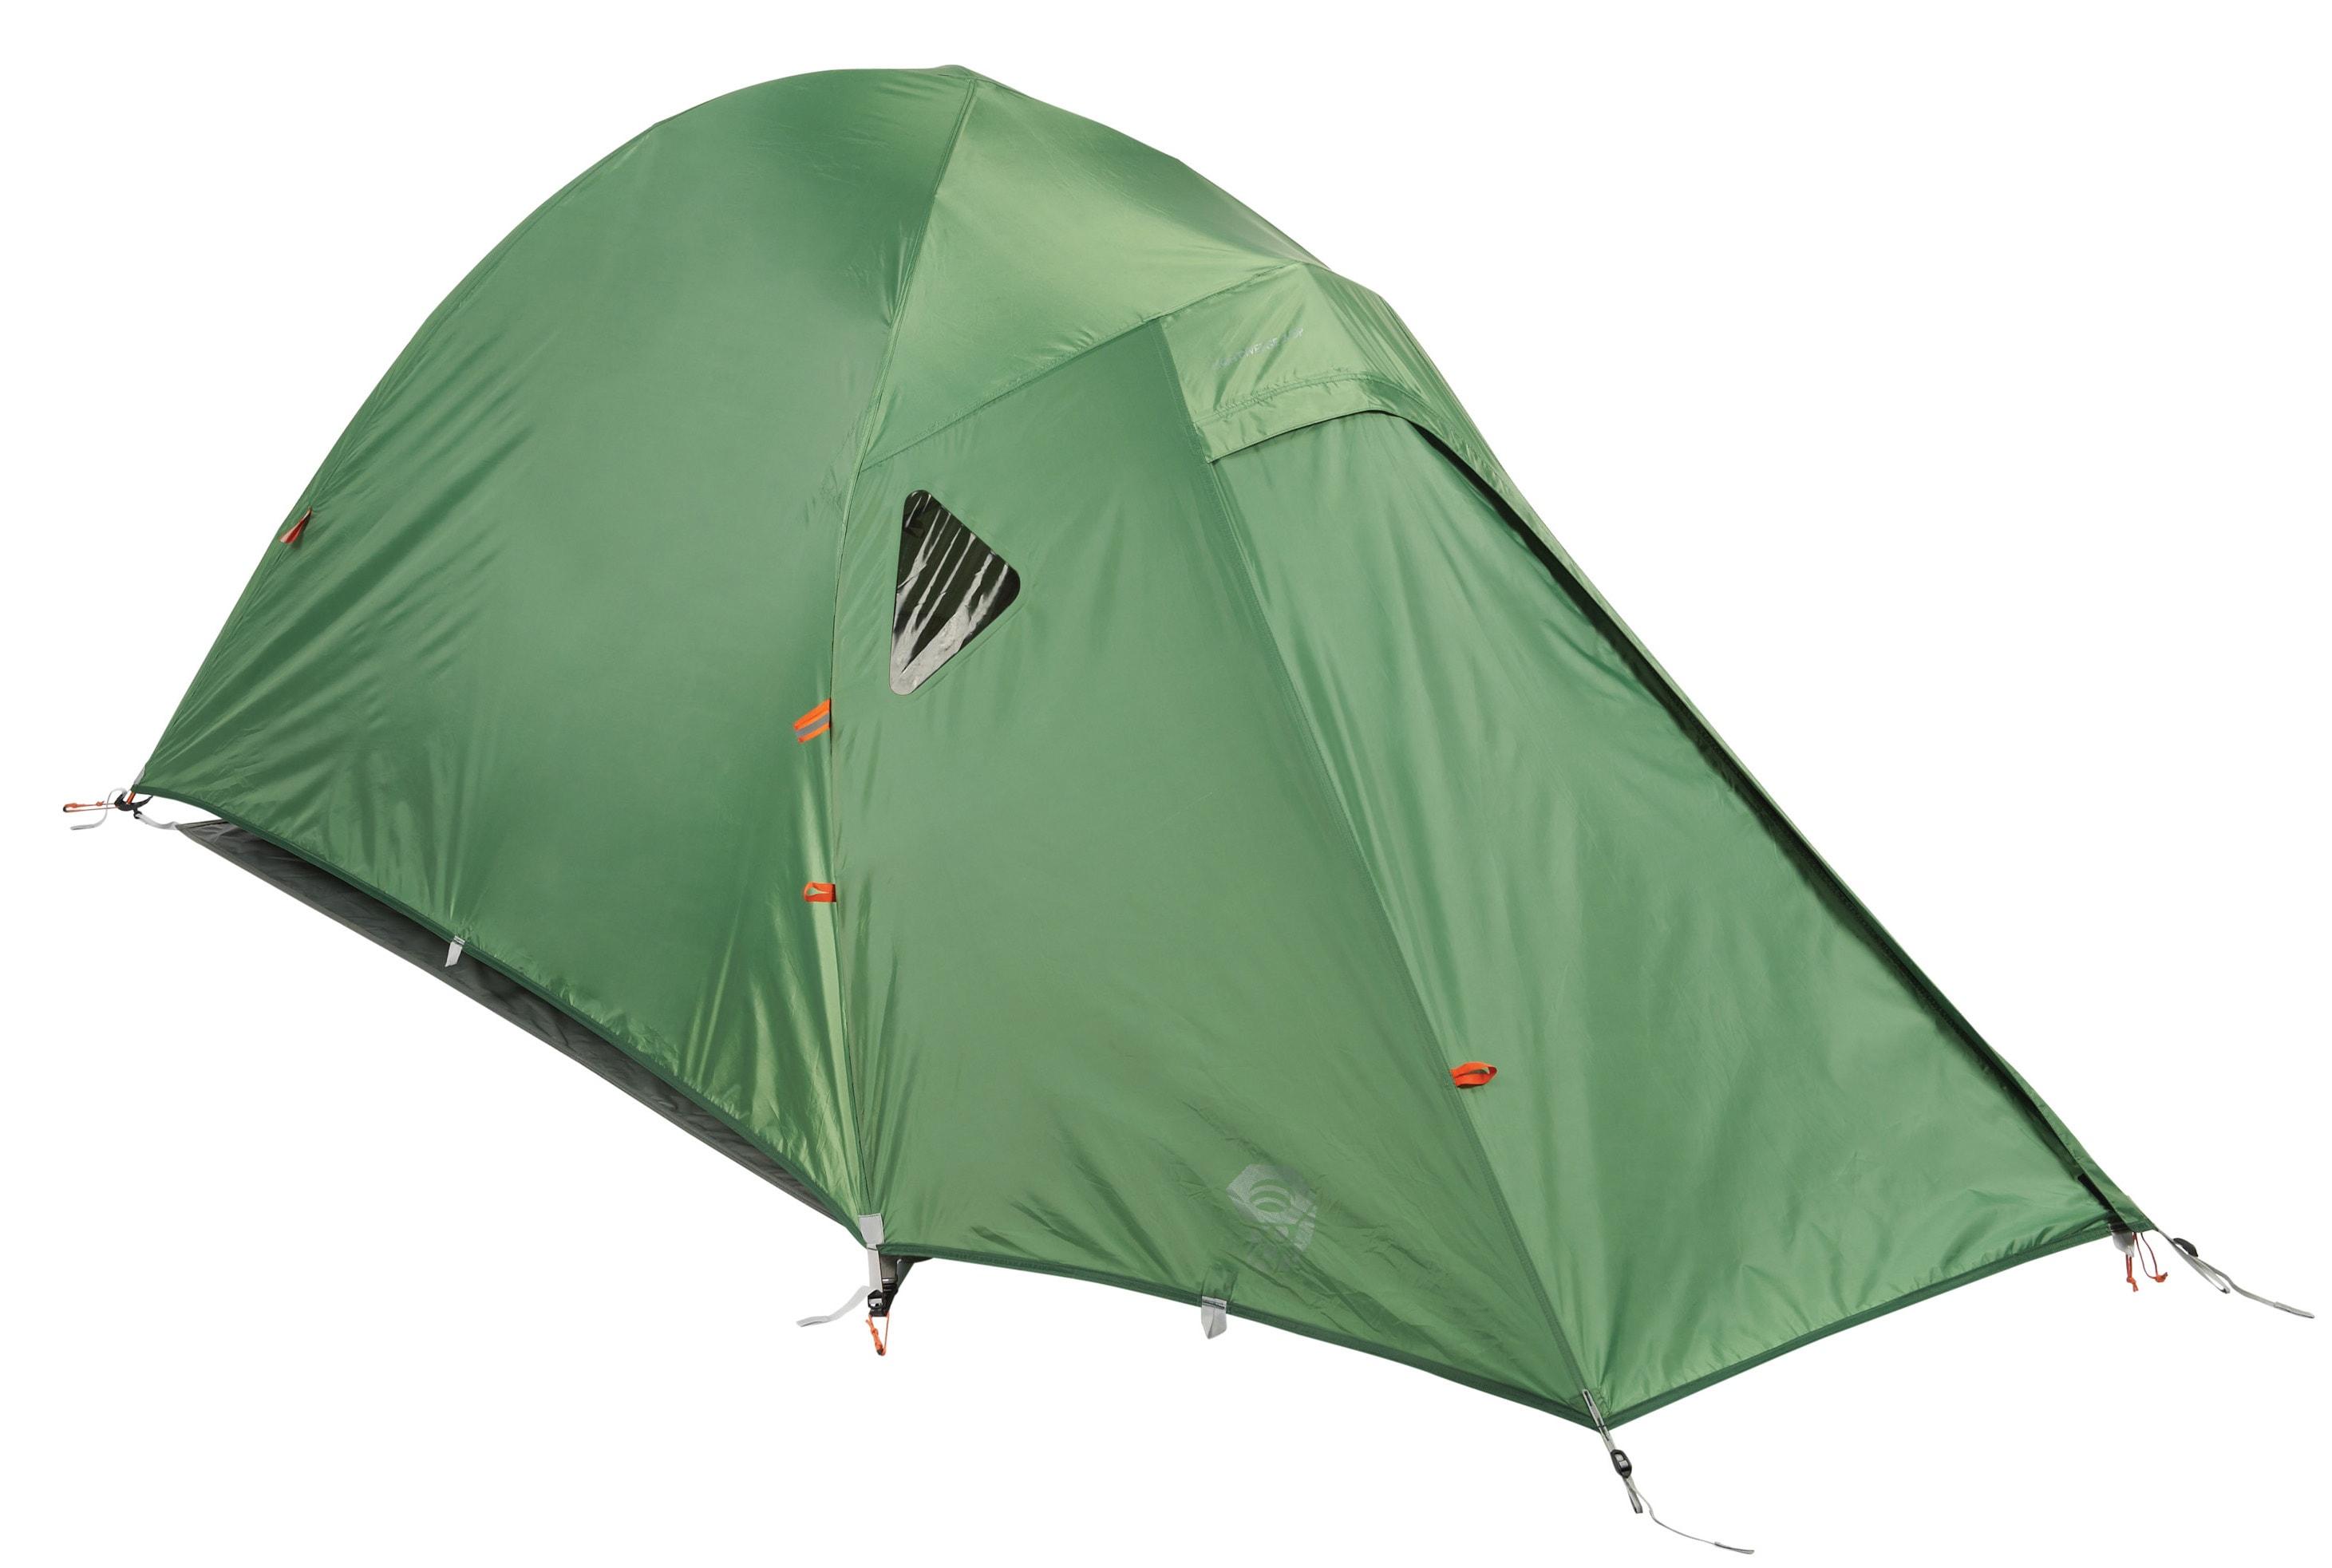 Mountain Hardwear Lightwedge 2 DP Tent - thumbnail 1  sc 1 st  The House & On Sale Mountain Hardwear Lightwedge 2 DP Tent up to 55% off